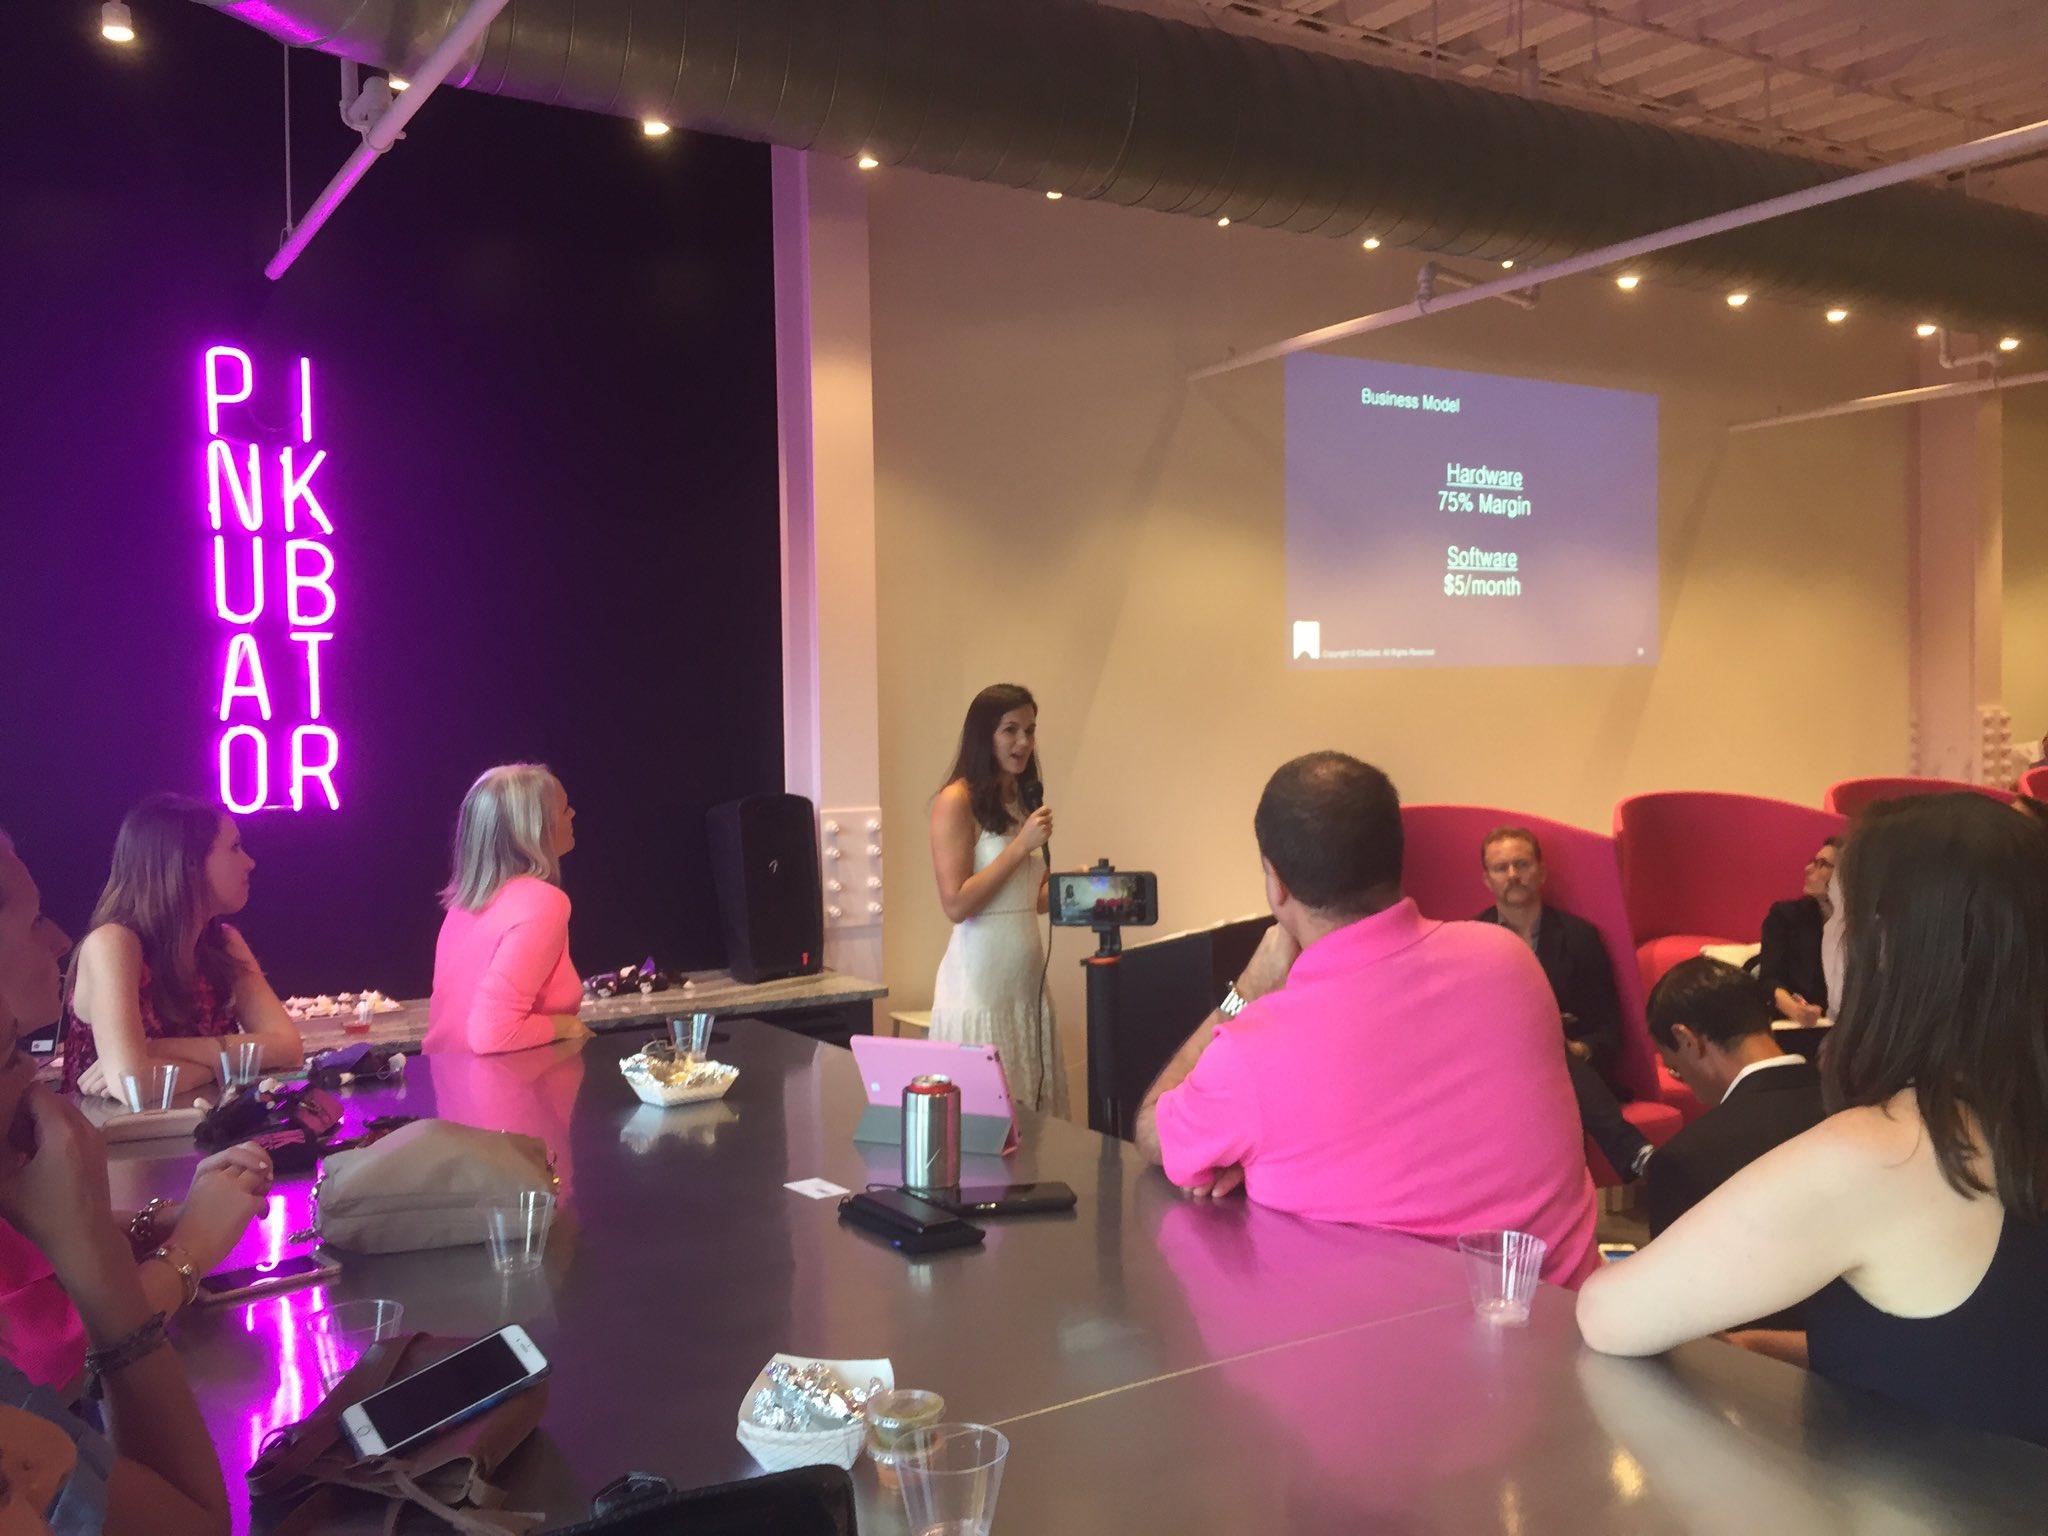 Cindy Eckert pitch investors meeting